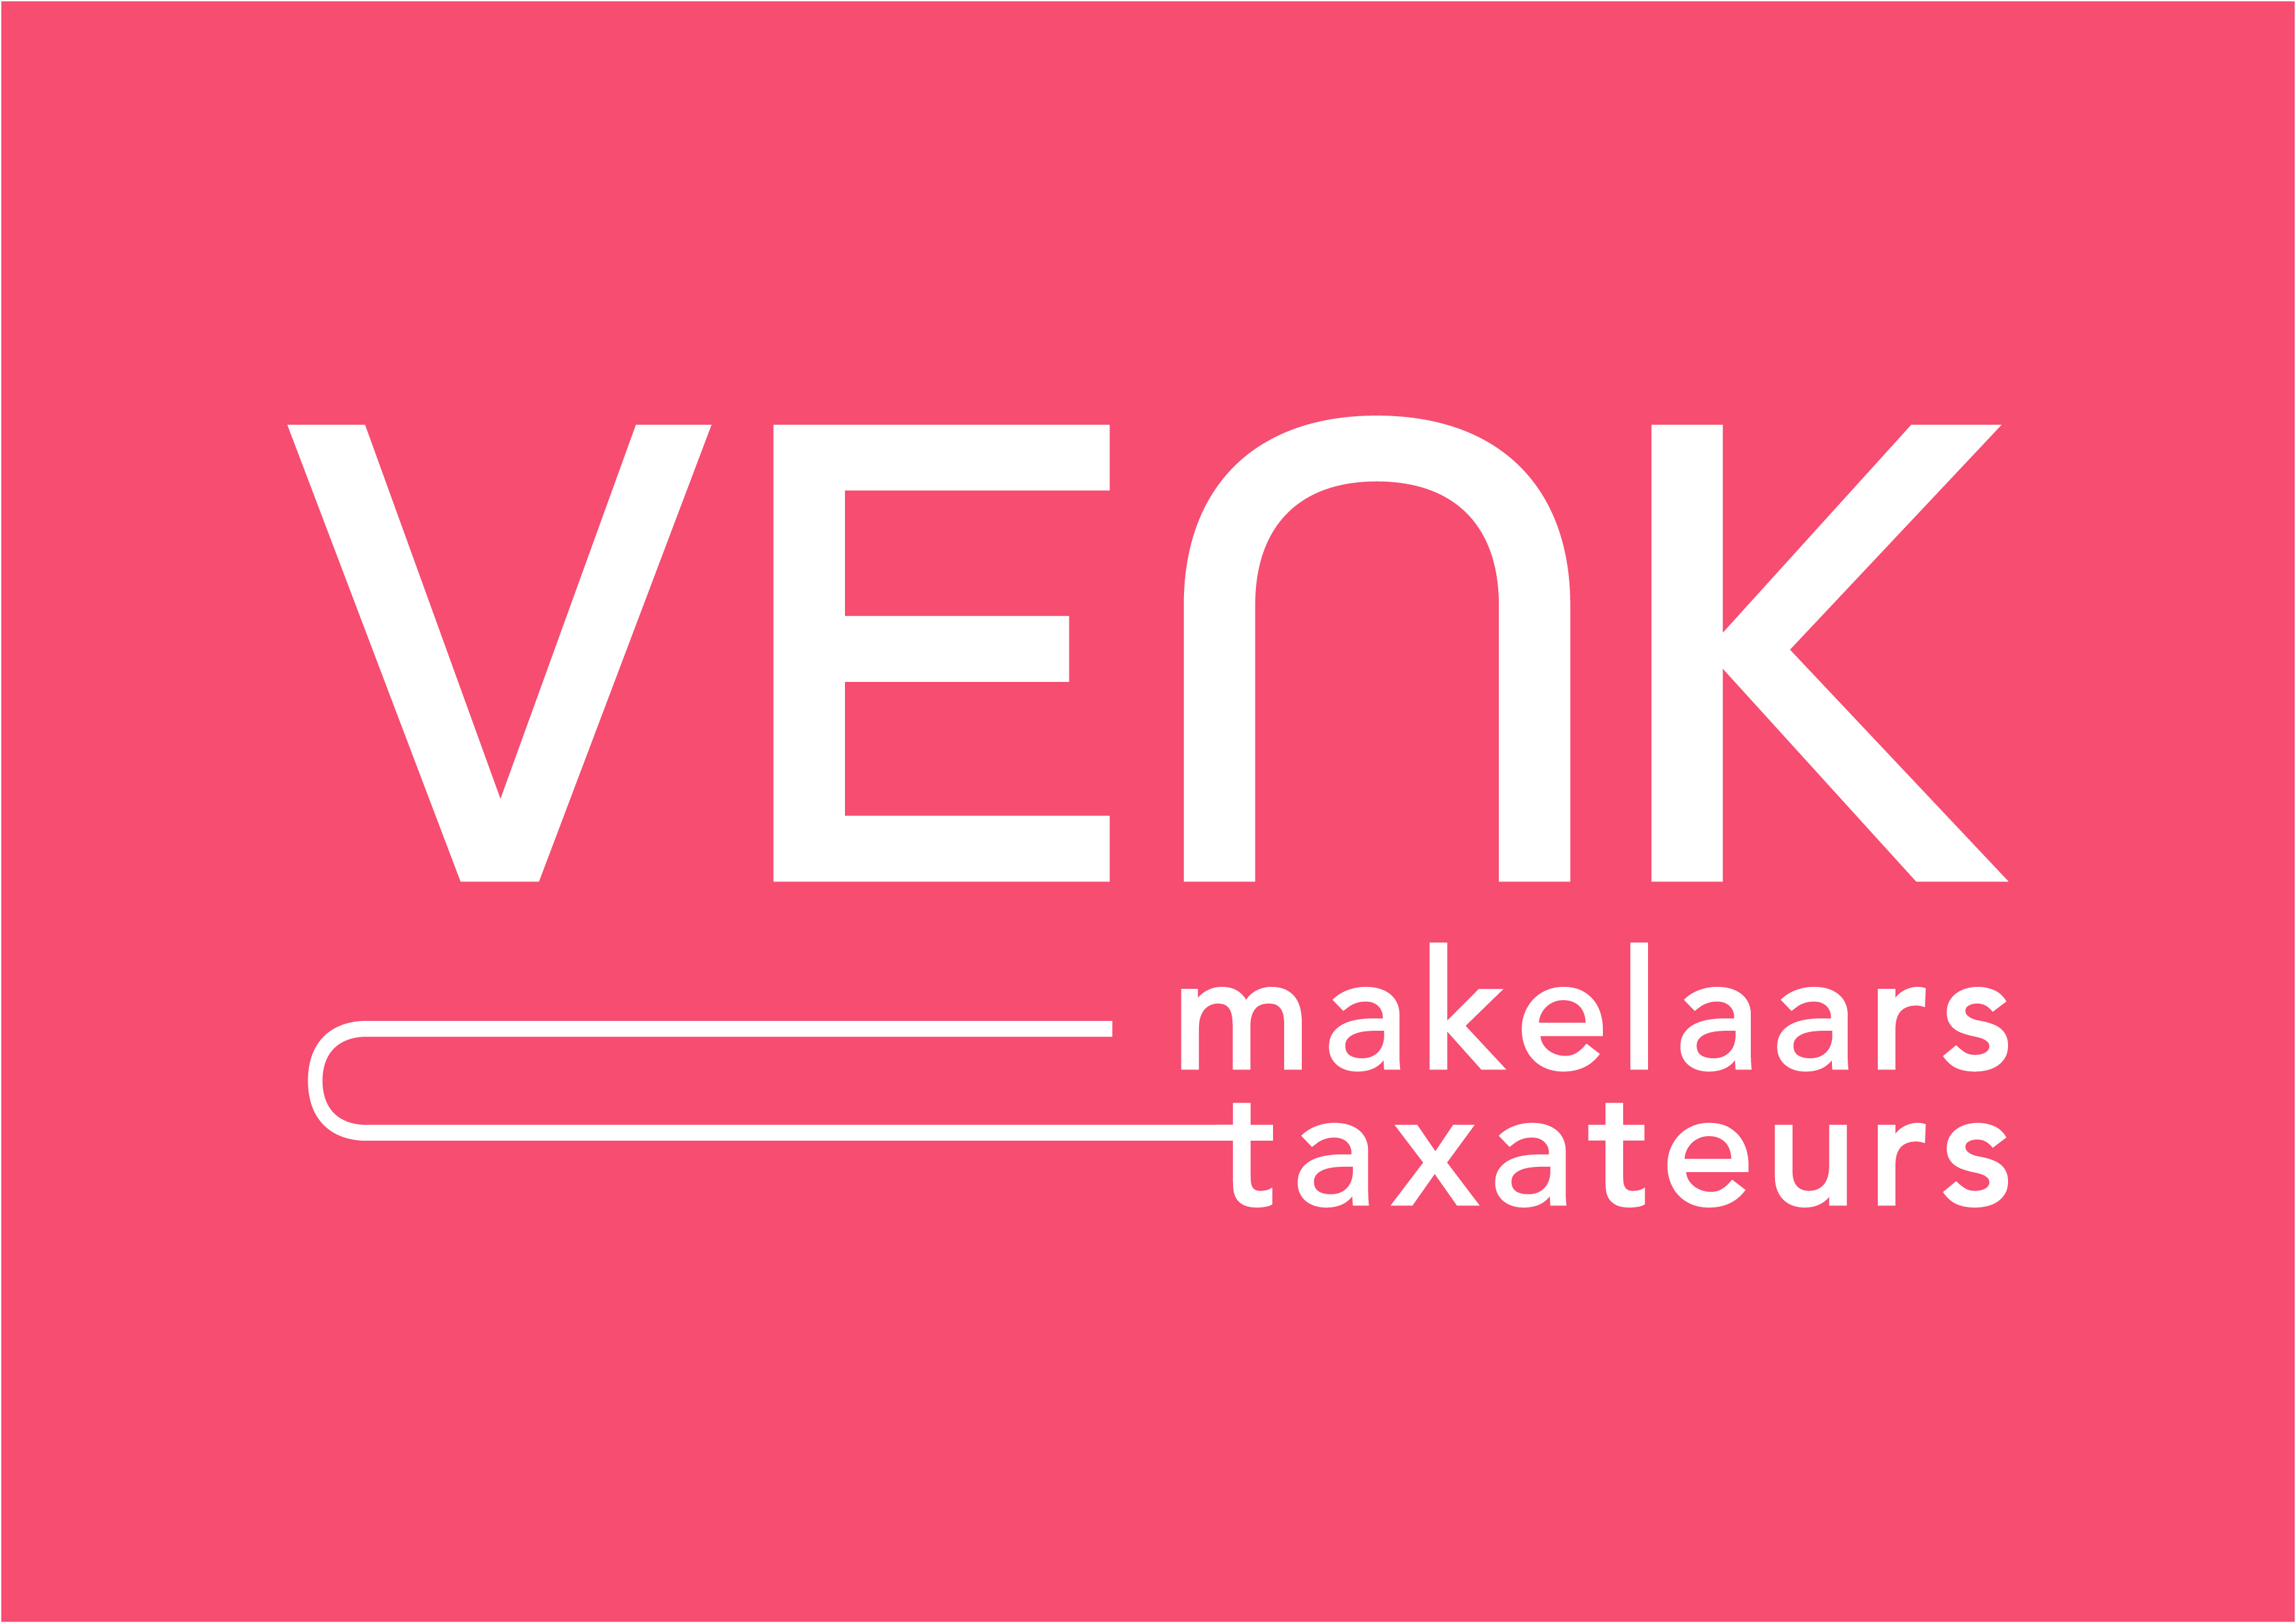 Kantoor Vestiging Velthaak & Keijzer Makelaars / Taxateurs o.g.